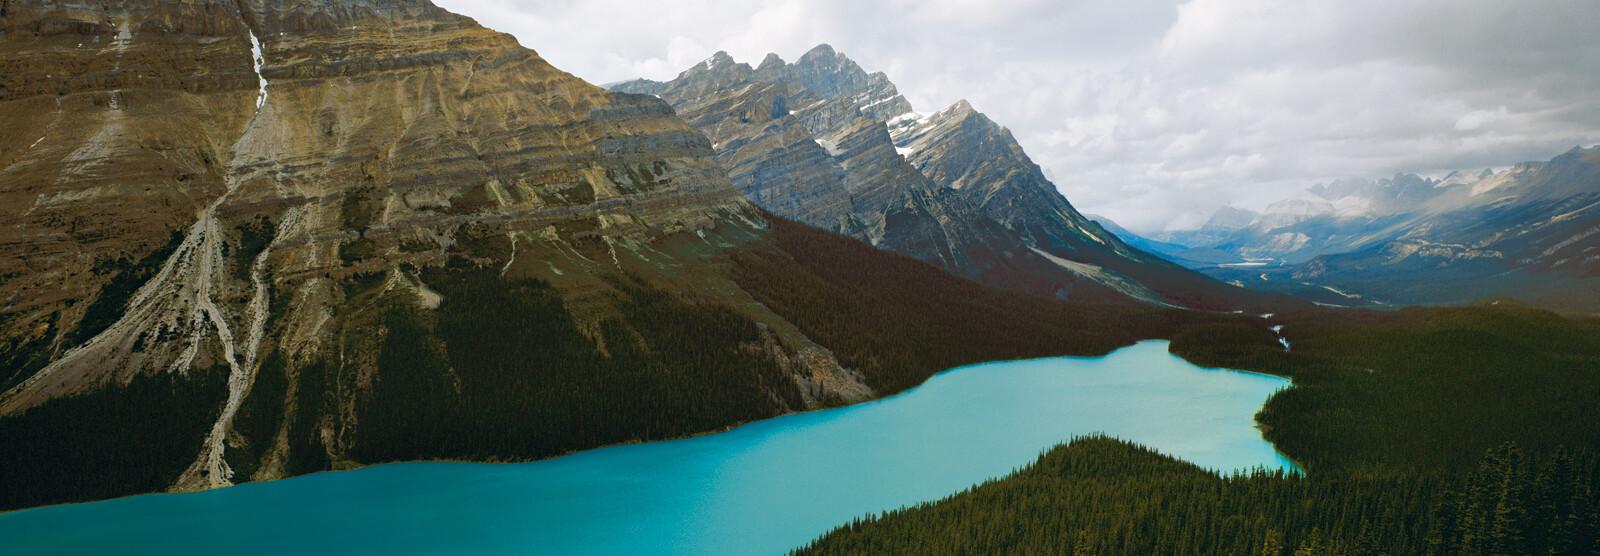 Peyto Lake, Alberta, Canada - Axel M. Mosler